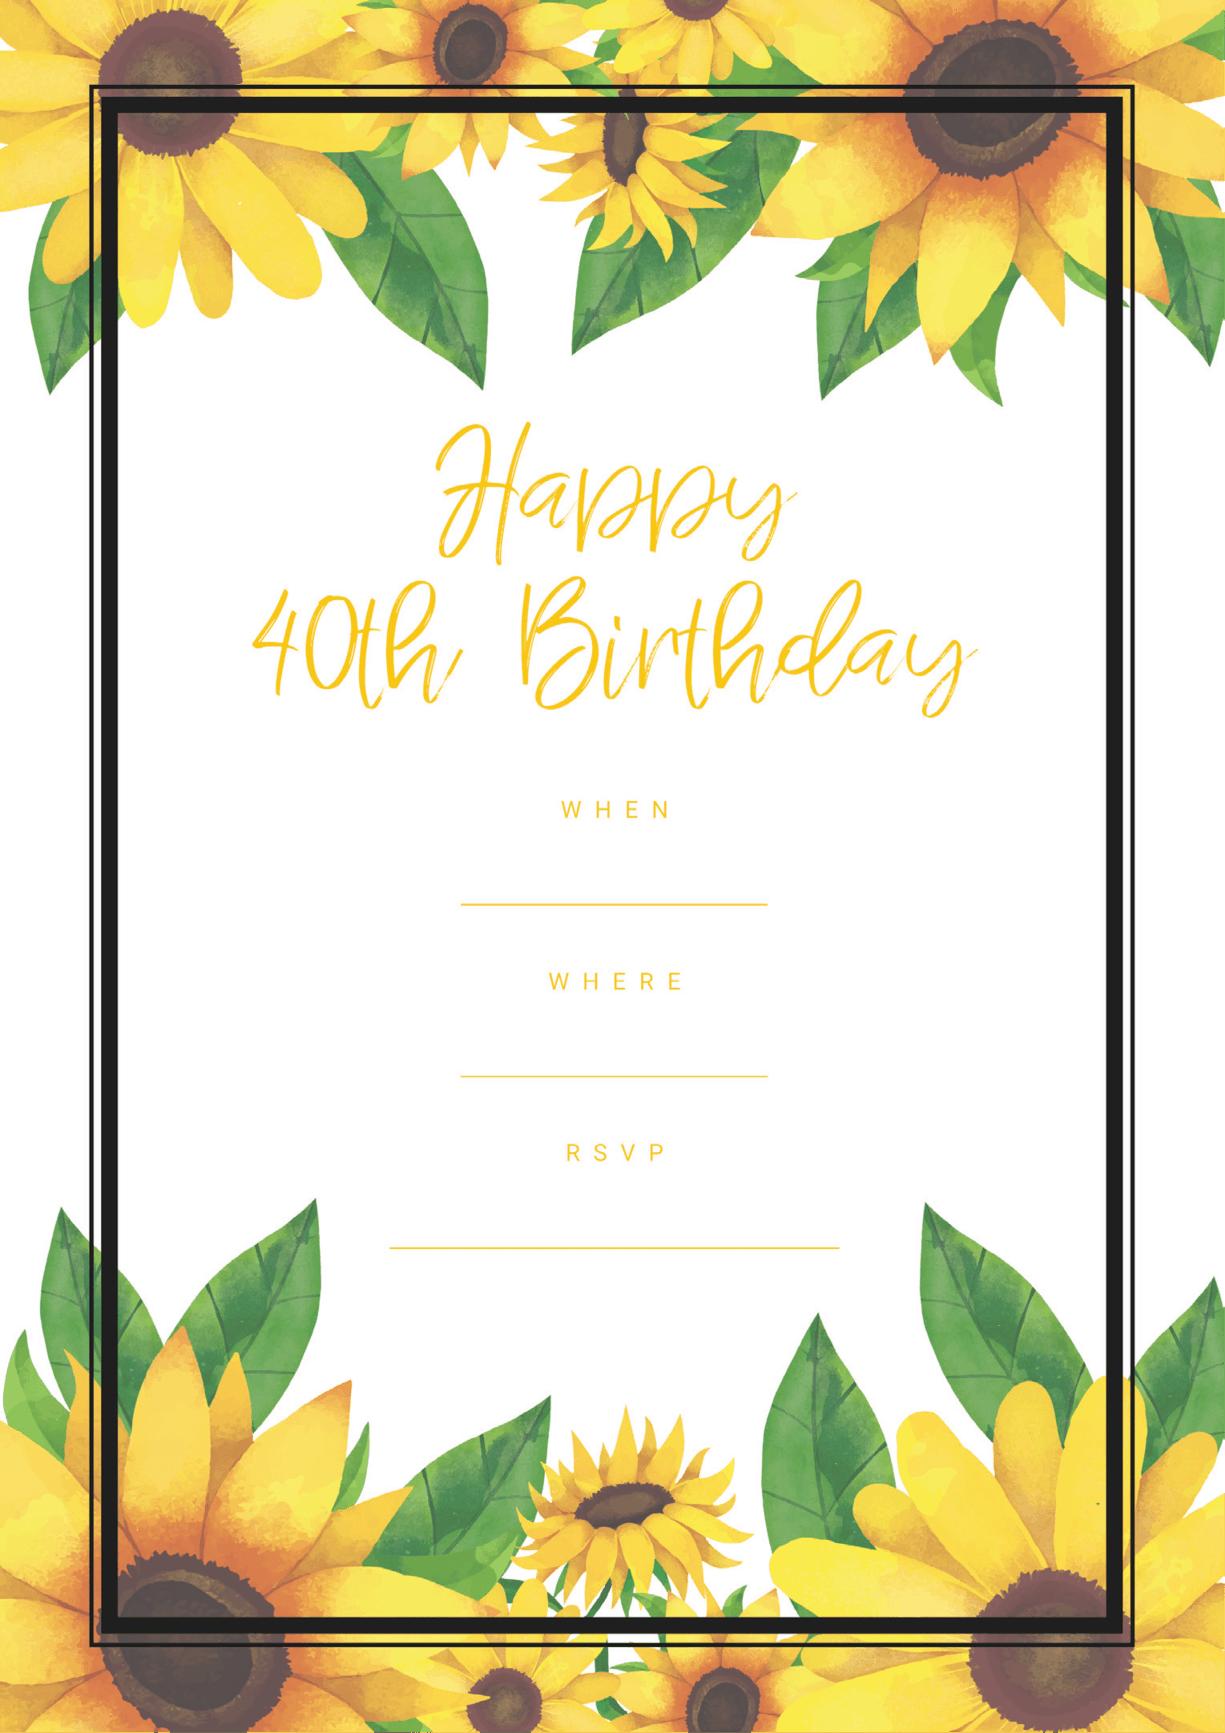 40th birthday invitation sunflower design